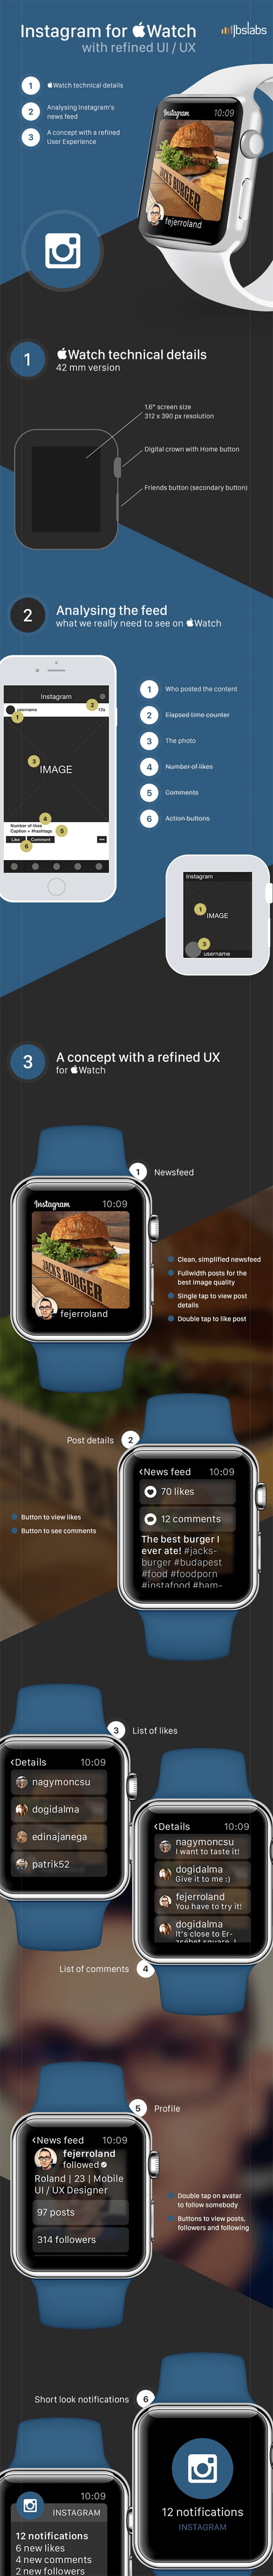 aplicatie Instagram Apple Watch